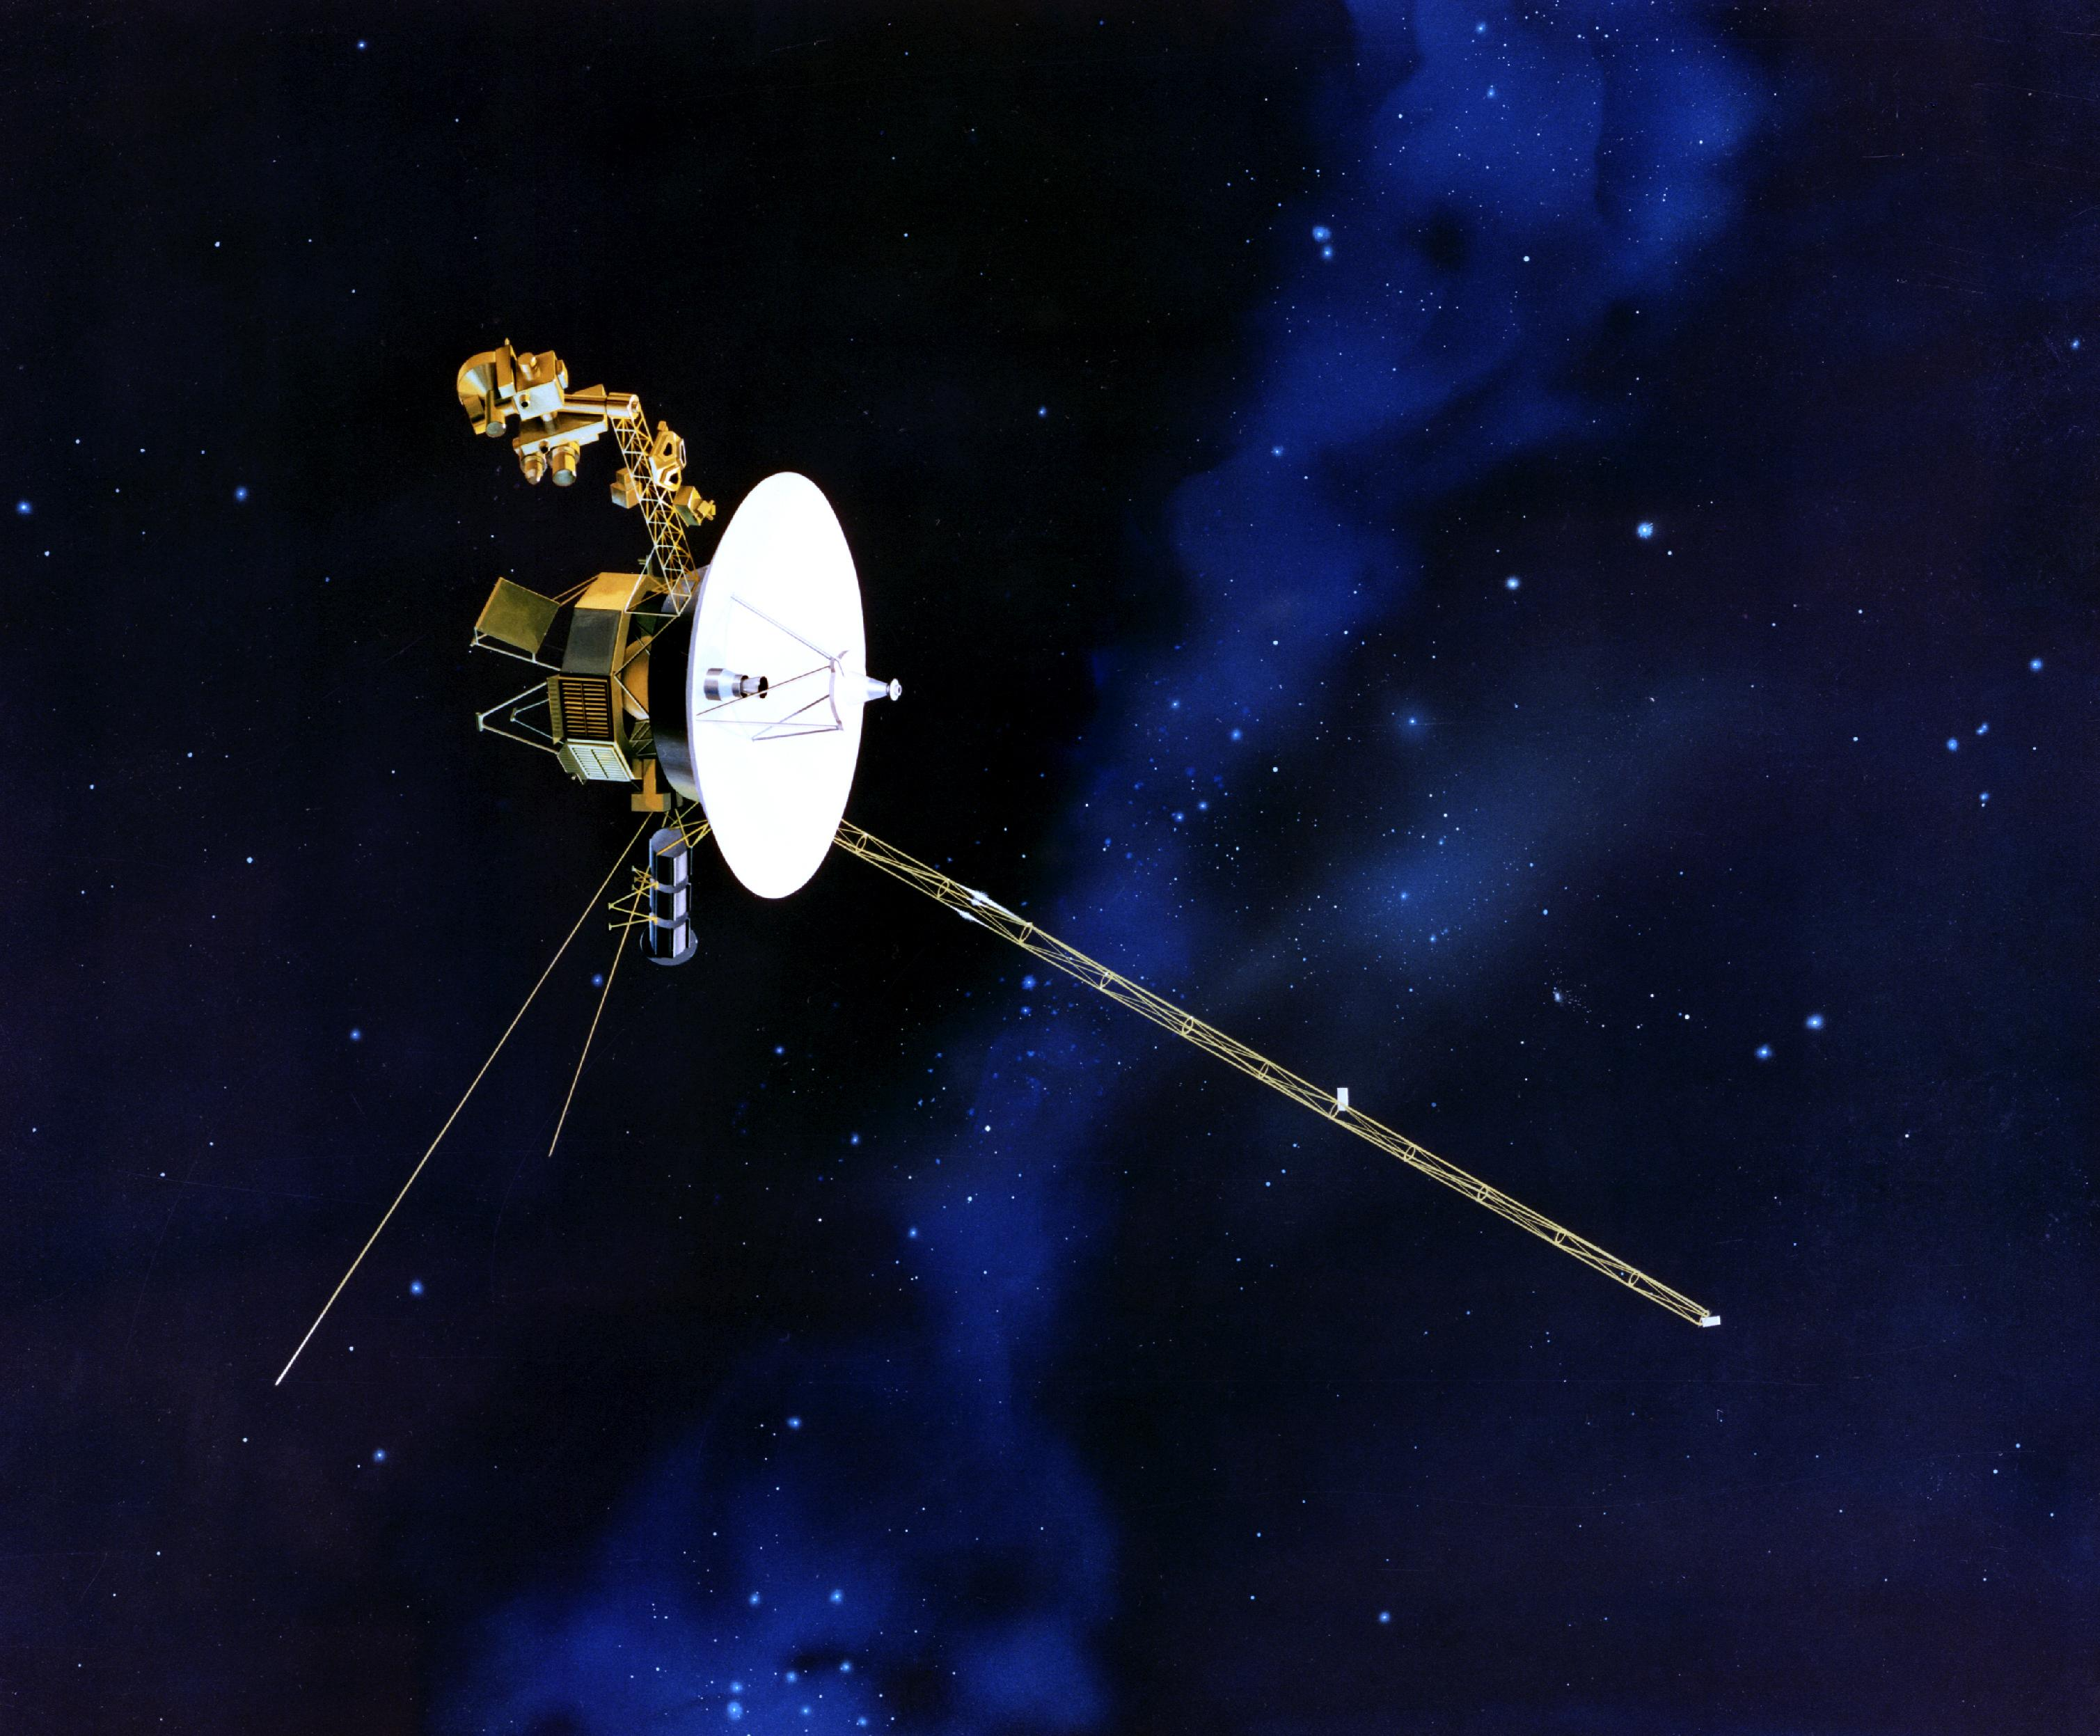 Misiunea Voyager